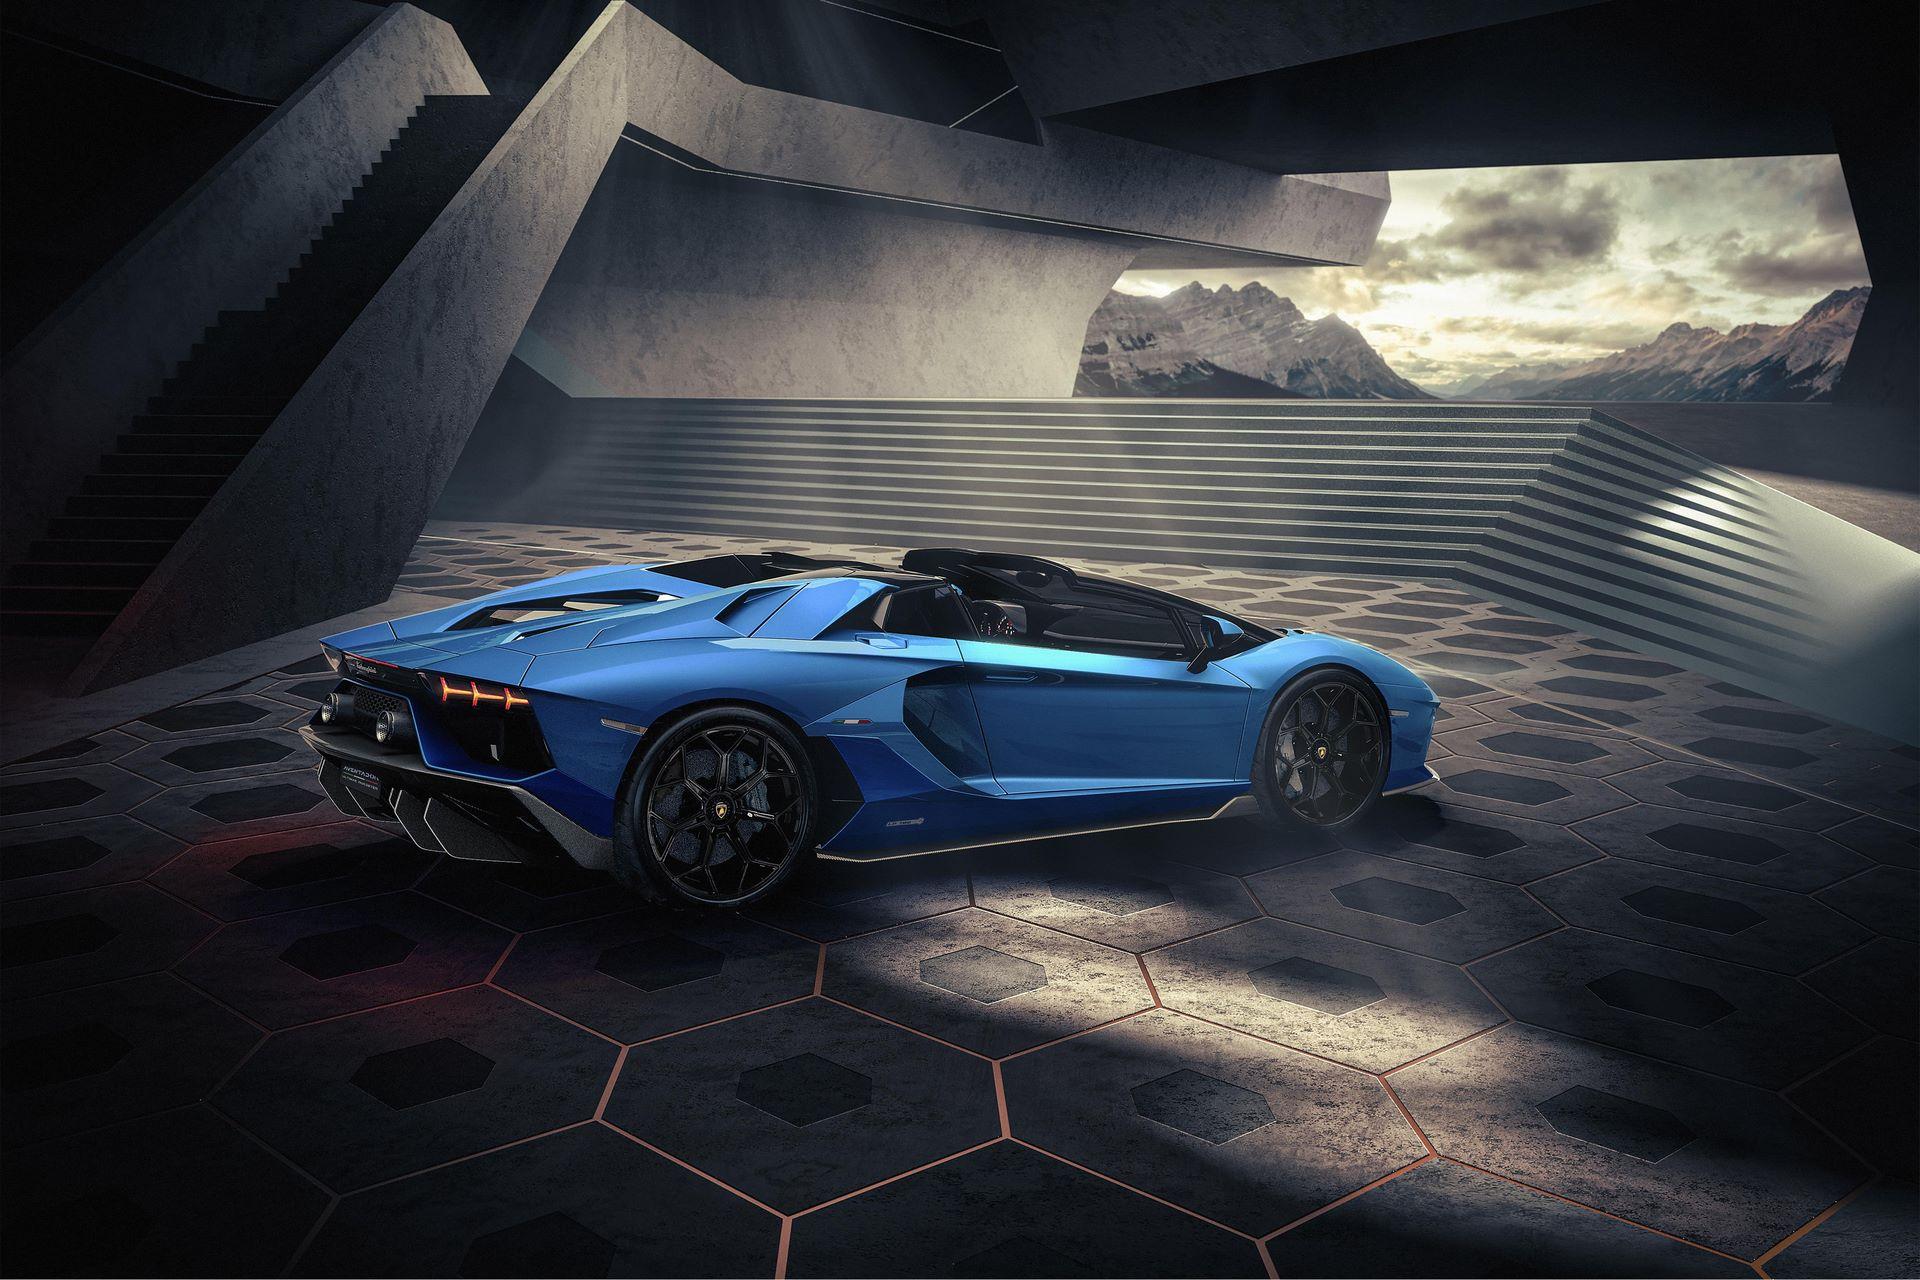 Lamborghini-Aventador-LP780-4-Ultimae-28